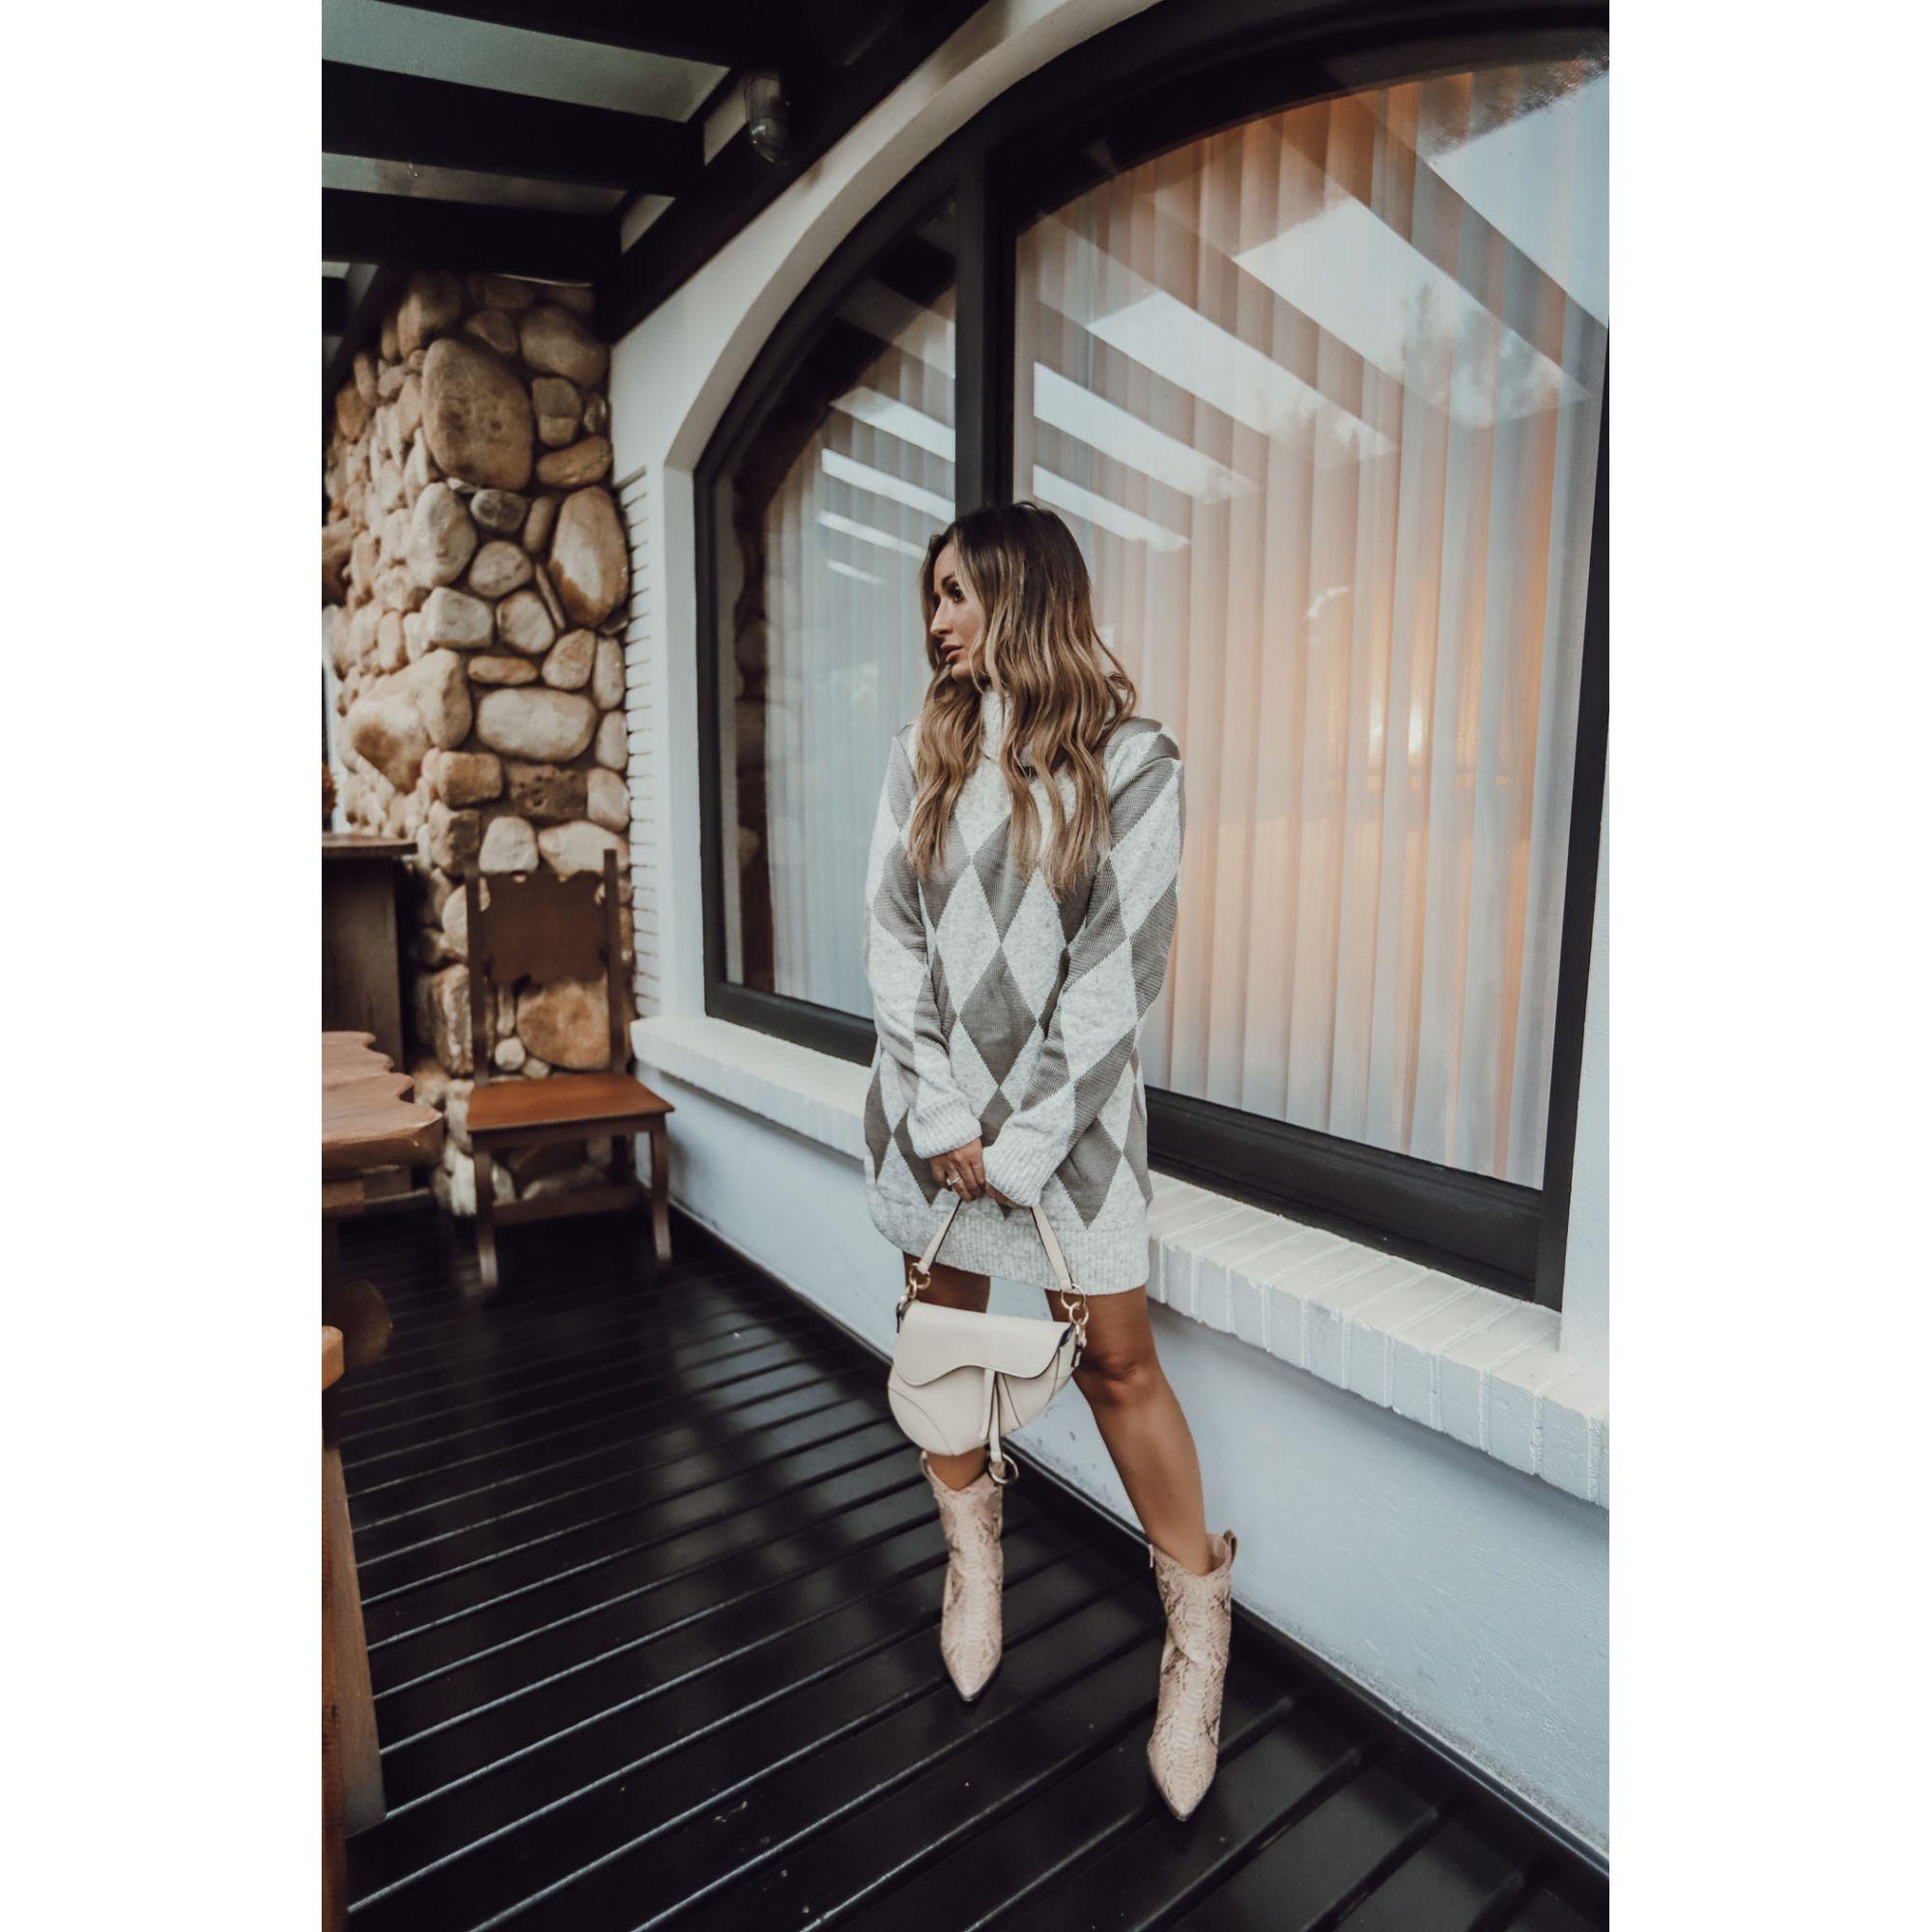 Vestido Curto Manga Longa Vera Tricot Gola Alta Feminino Cinza